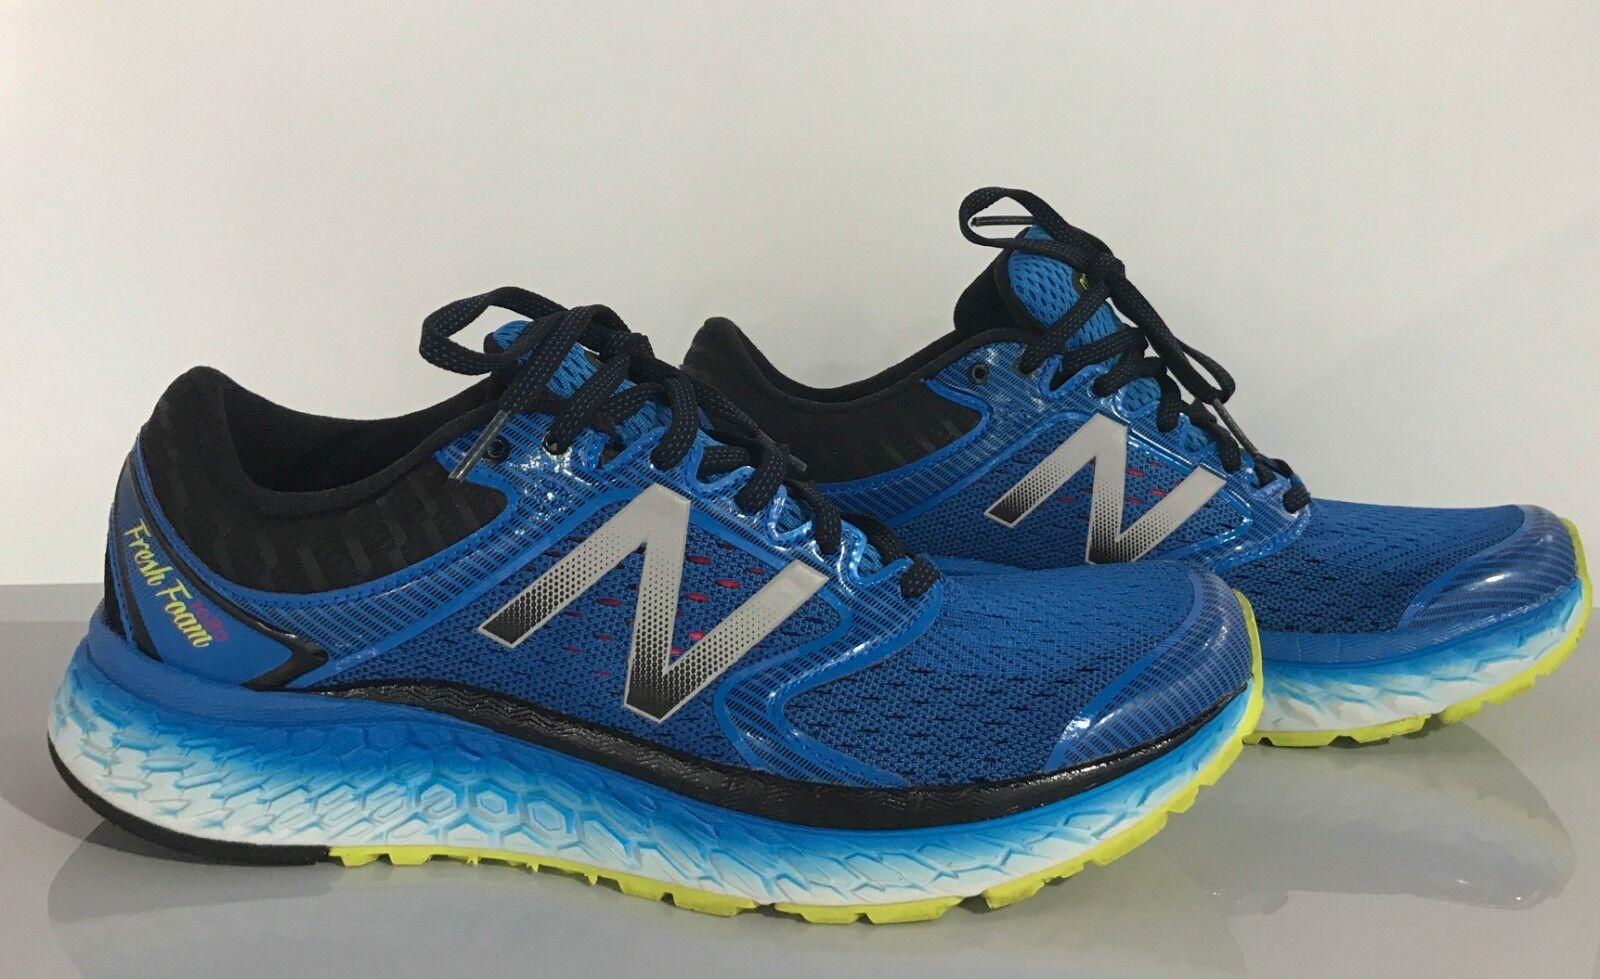 New Balance Men's Running shoes, Electric bluee Hi Lite, 10 D US, M1080V7